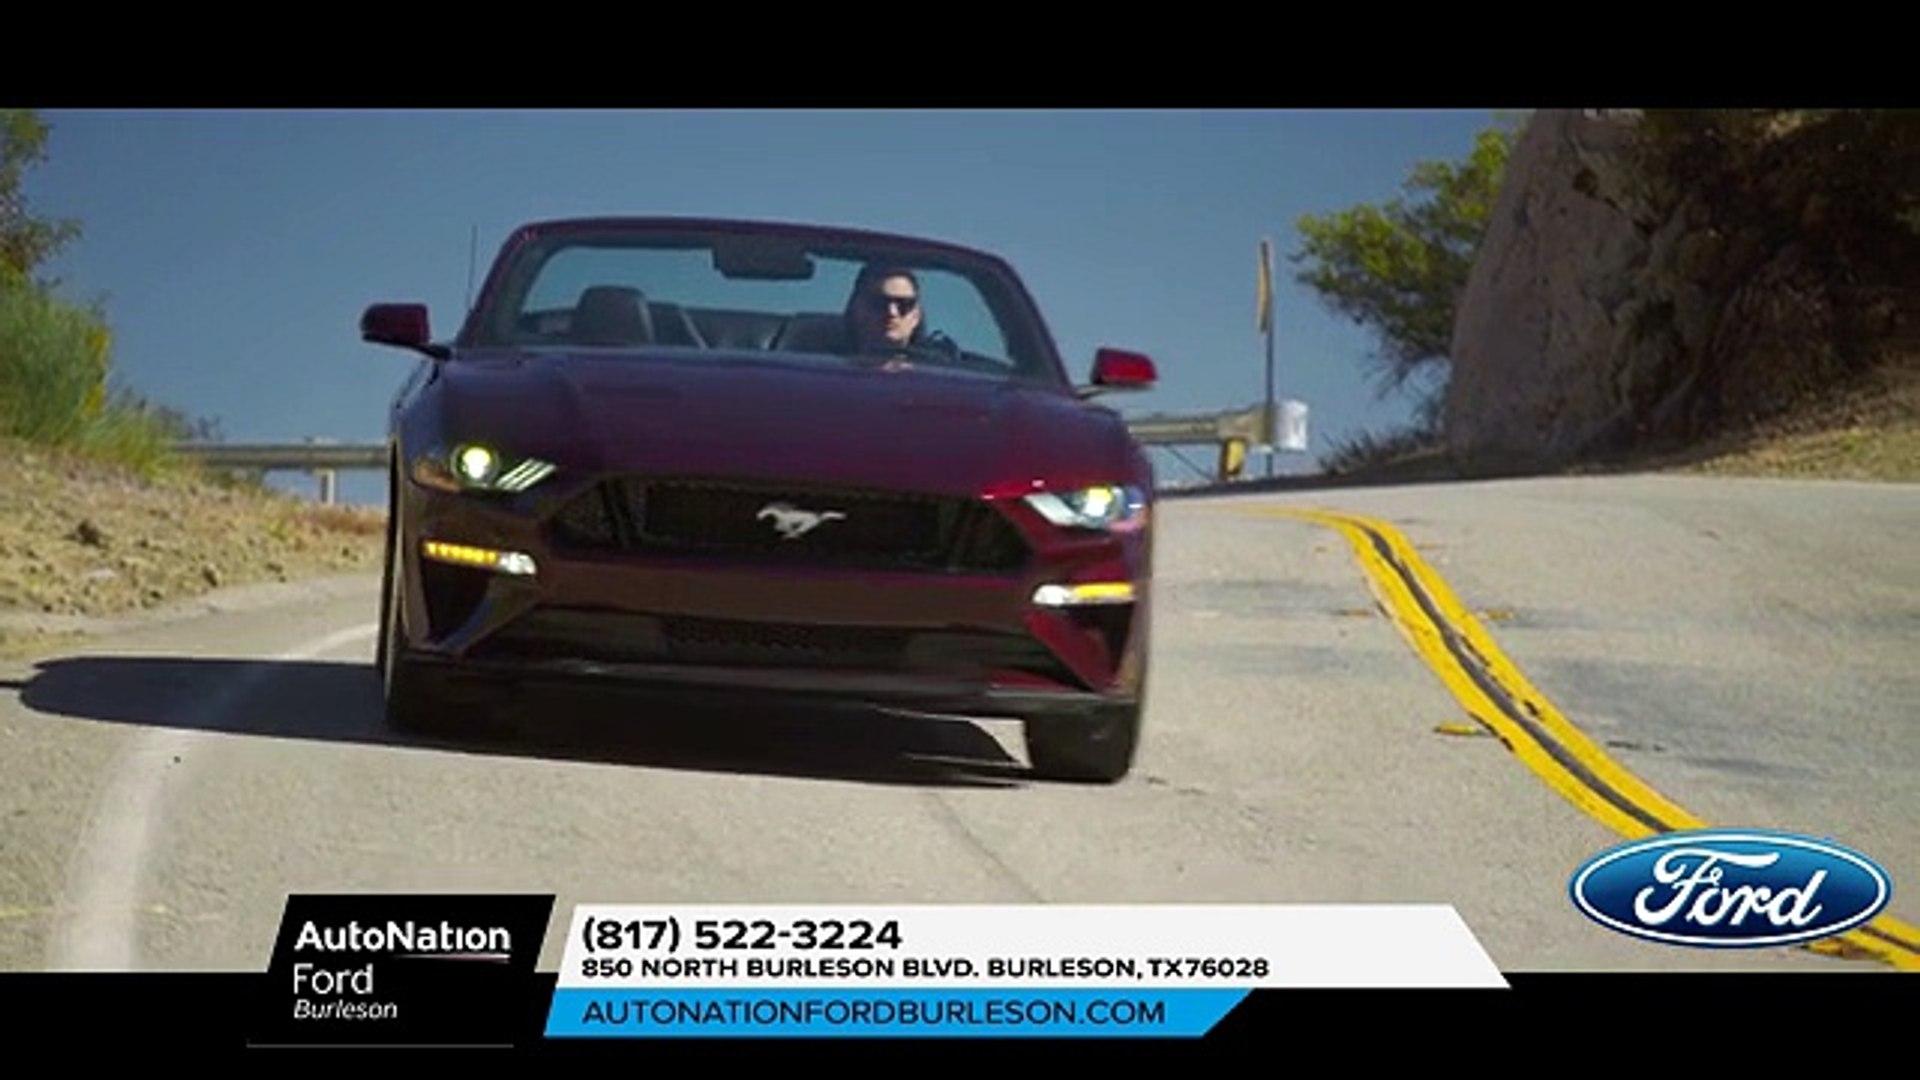 Autonation Ford Burleson >> Ford Mustang Dallas Tx 2018 Ford Mustang Dallas Tx Video